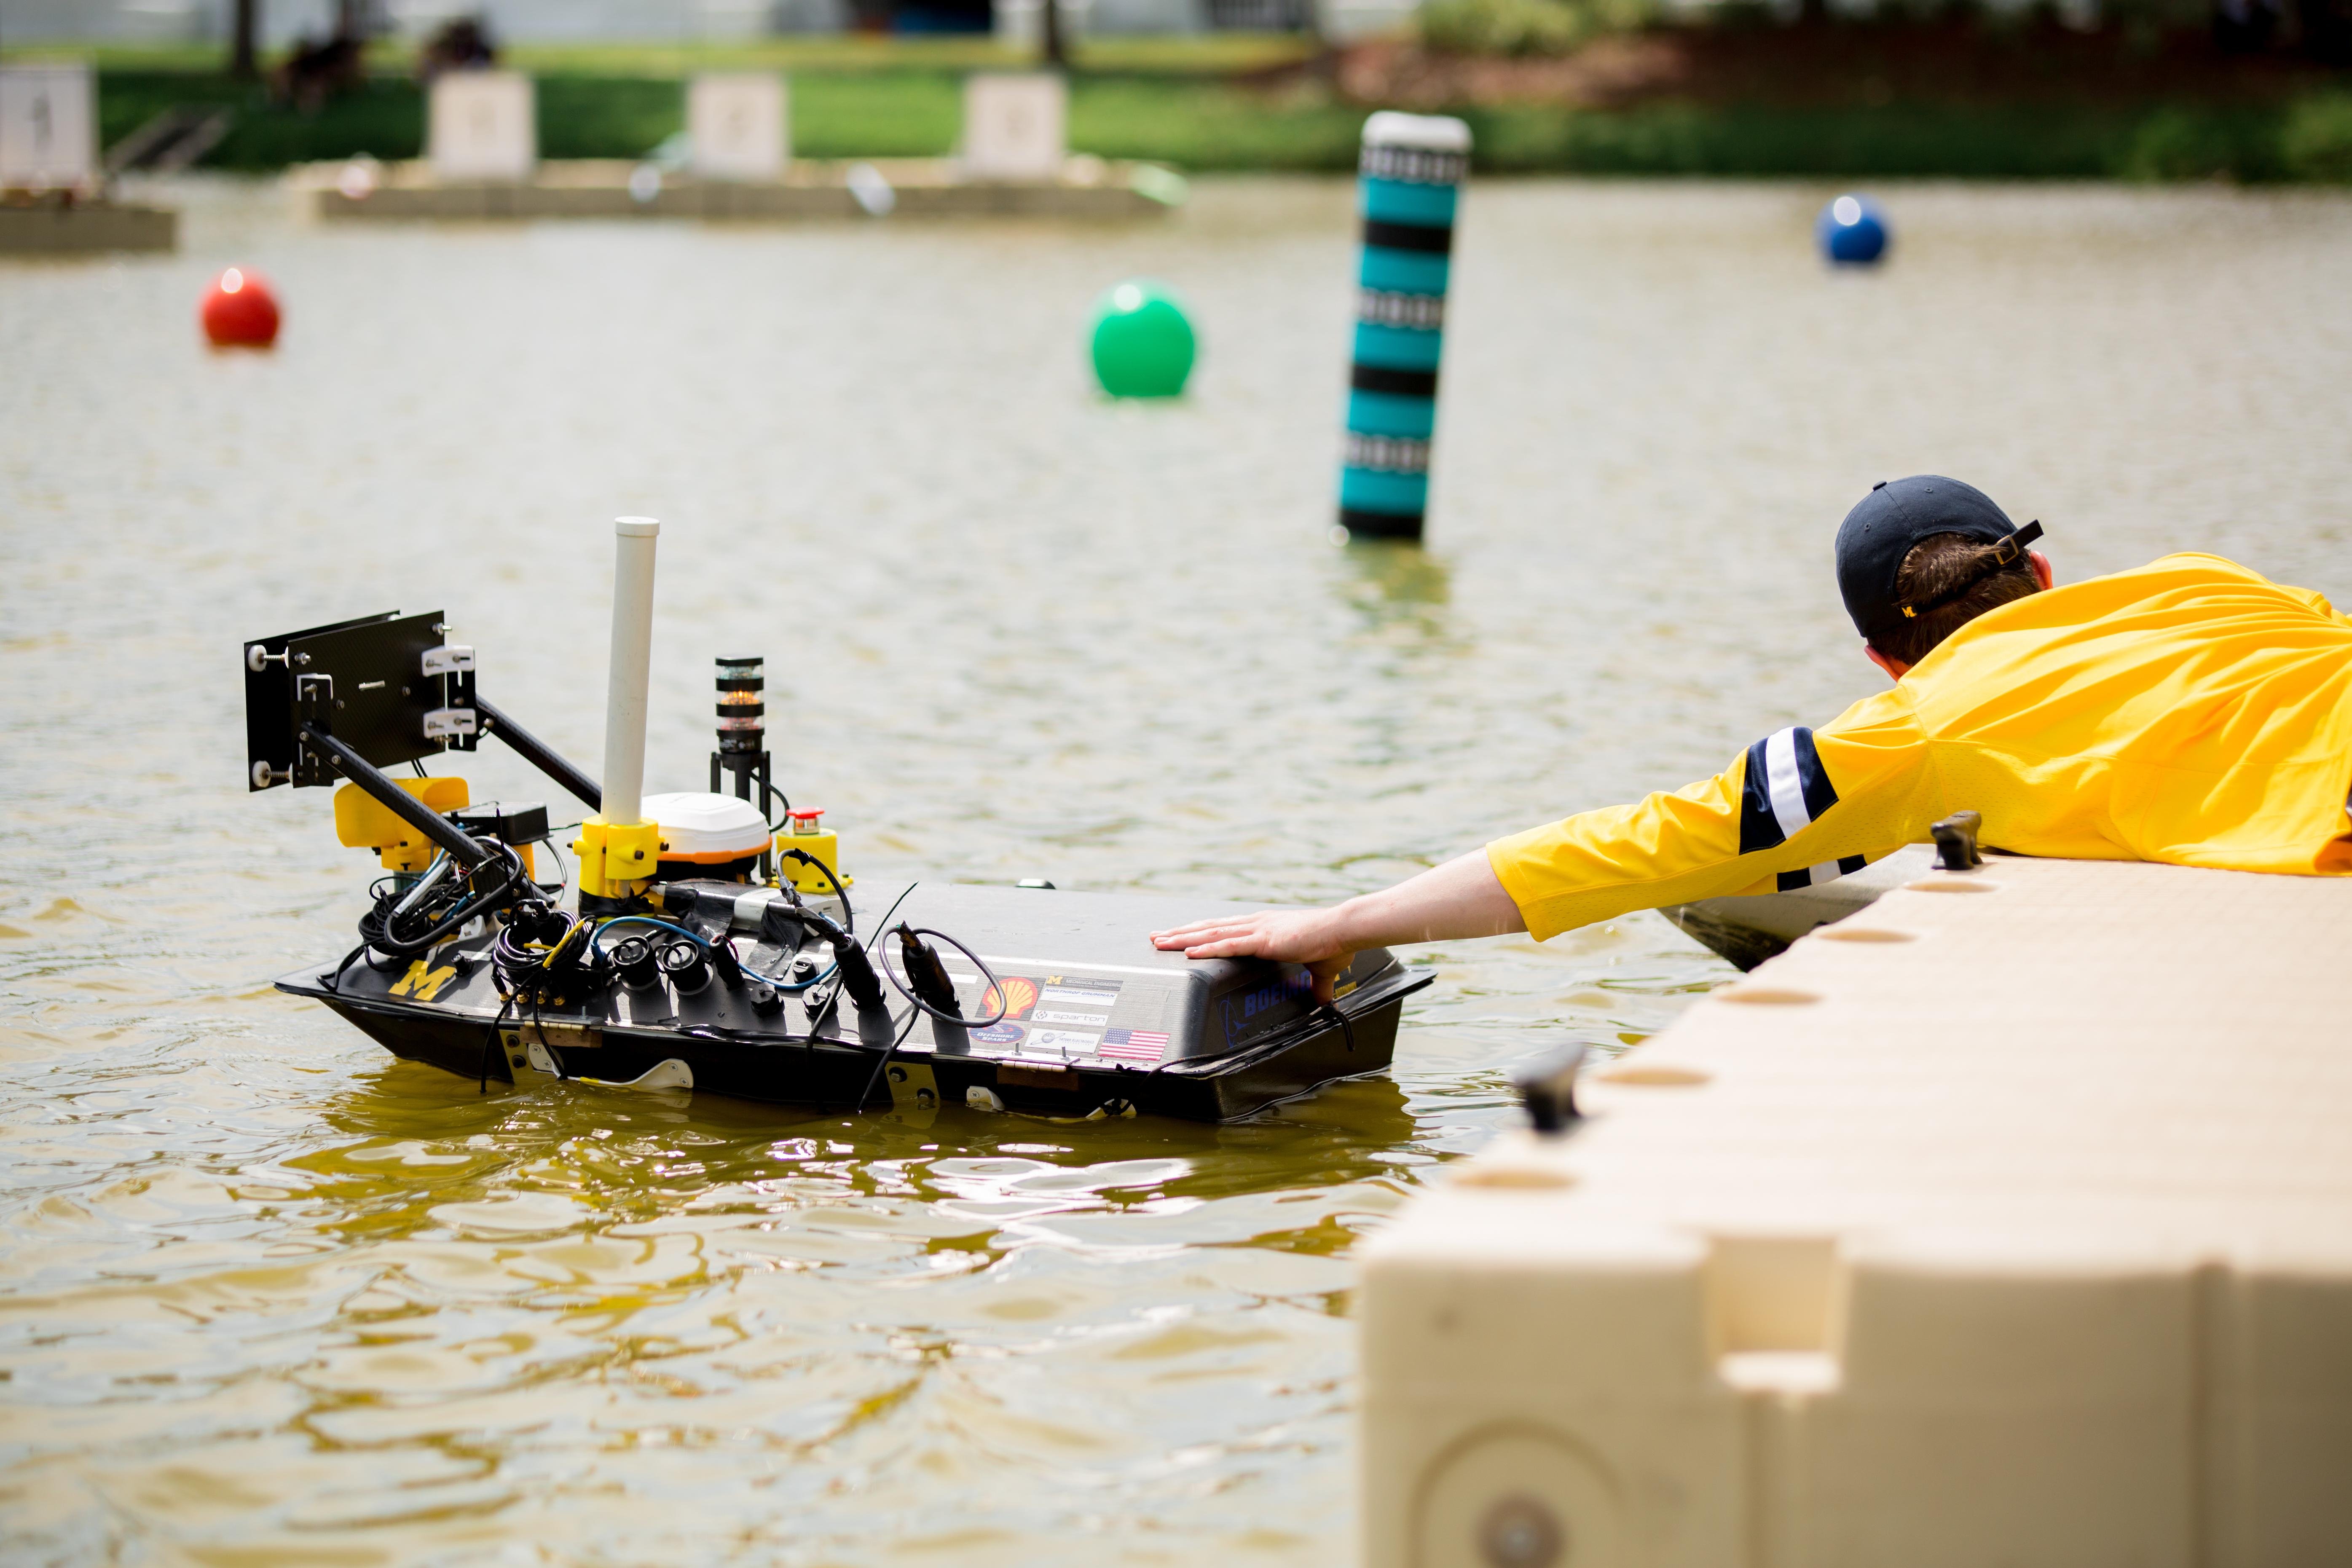 2019 RoboBoat | University of Michigan team